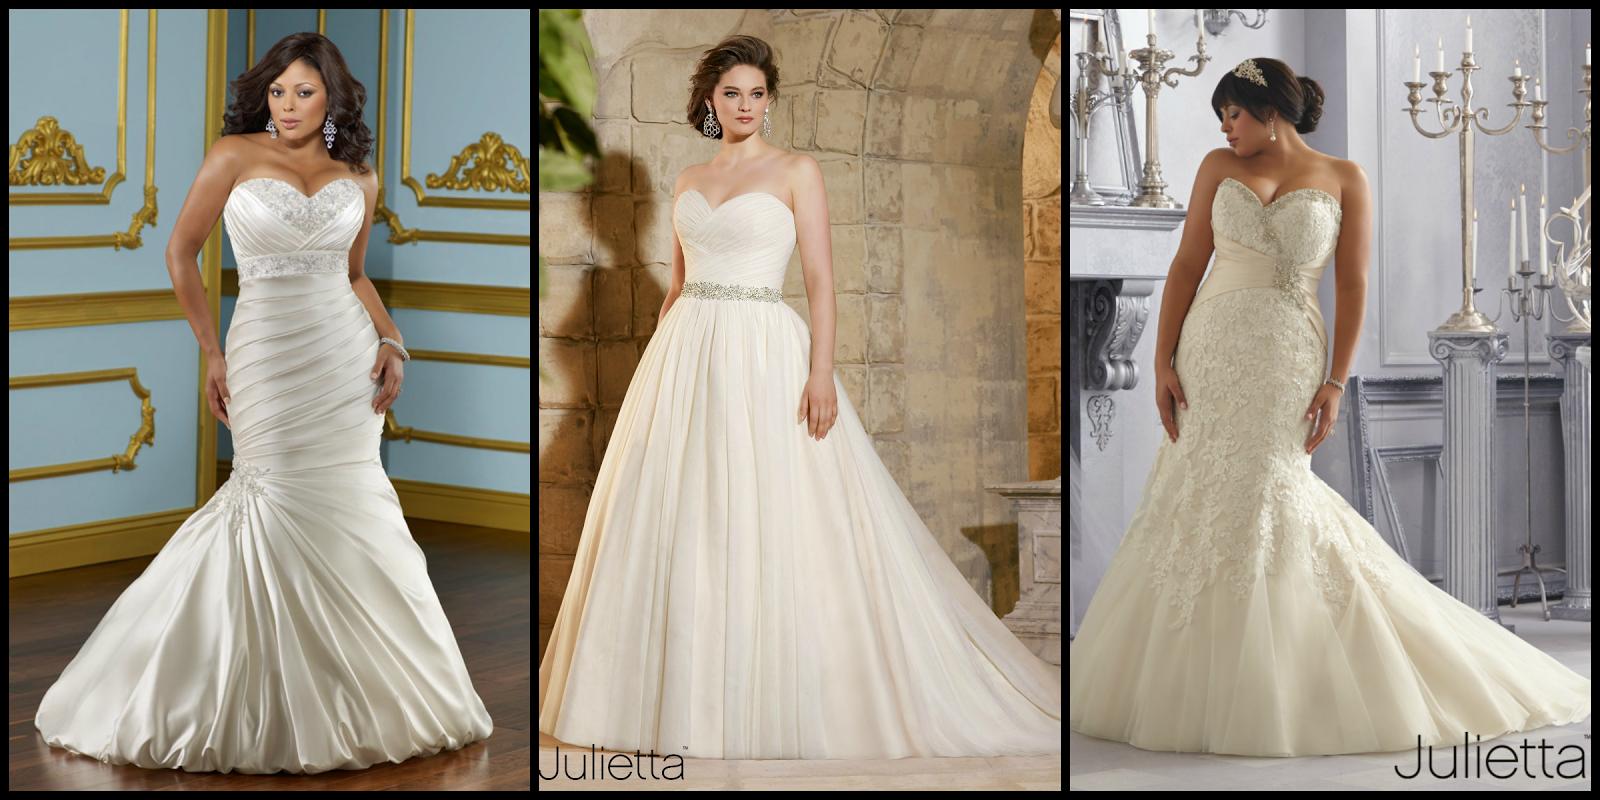 Plus Size Wedding Dresses Miami : Mori lee s julietta collection gorgeous plus size wedding gowns